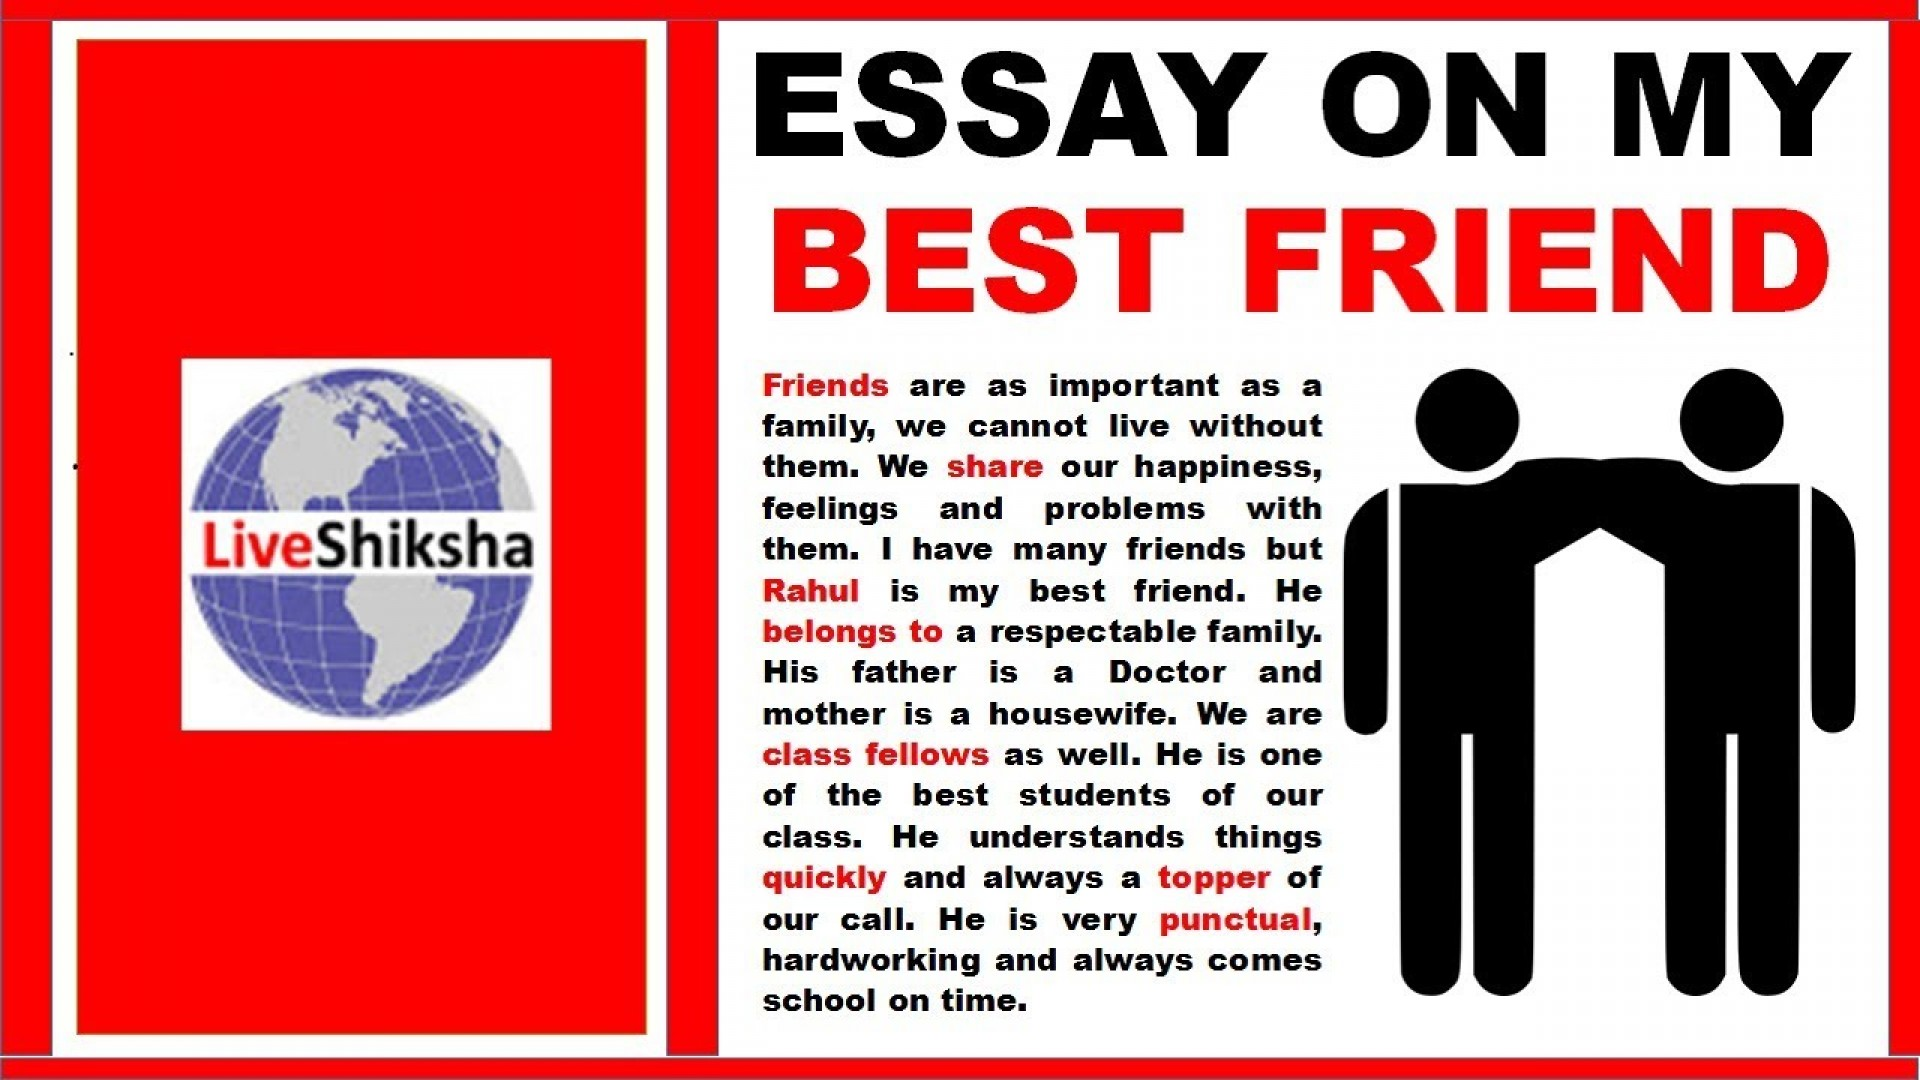 001 Maxresdefault My Best Friend Essay Marvelous For Class 2 In Urdu English 1 On 6 Marathi 1920